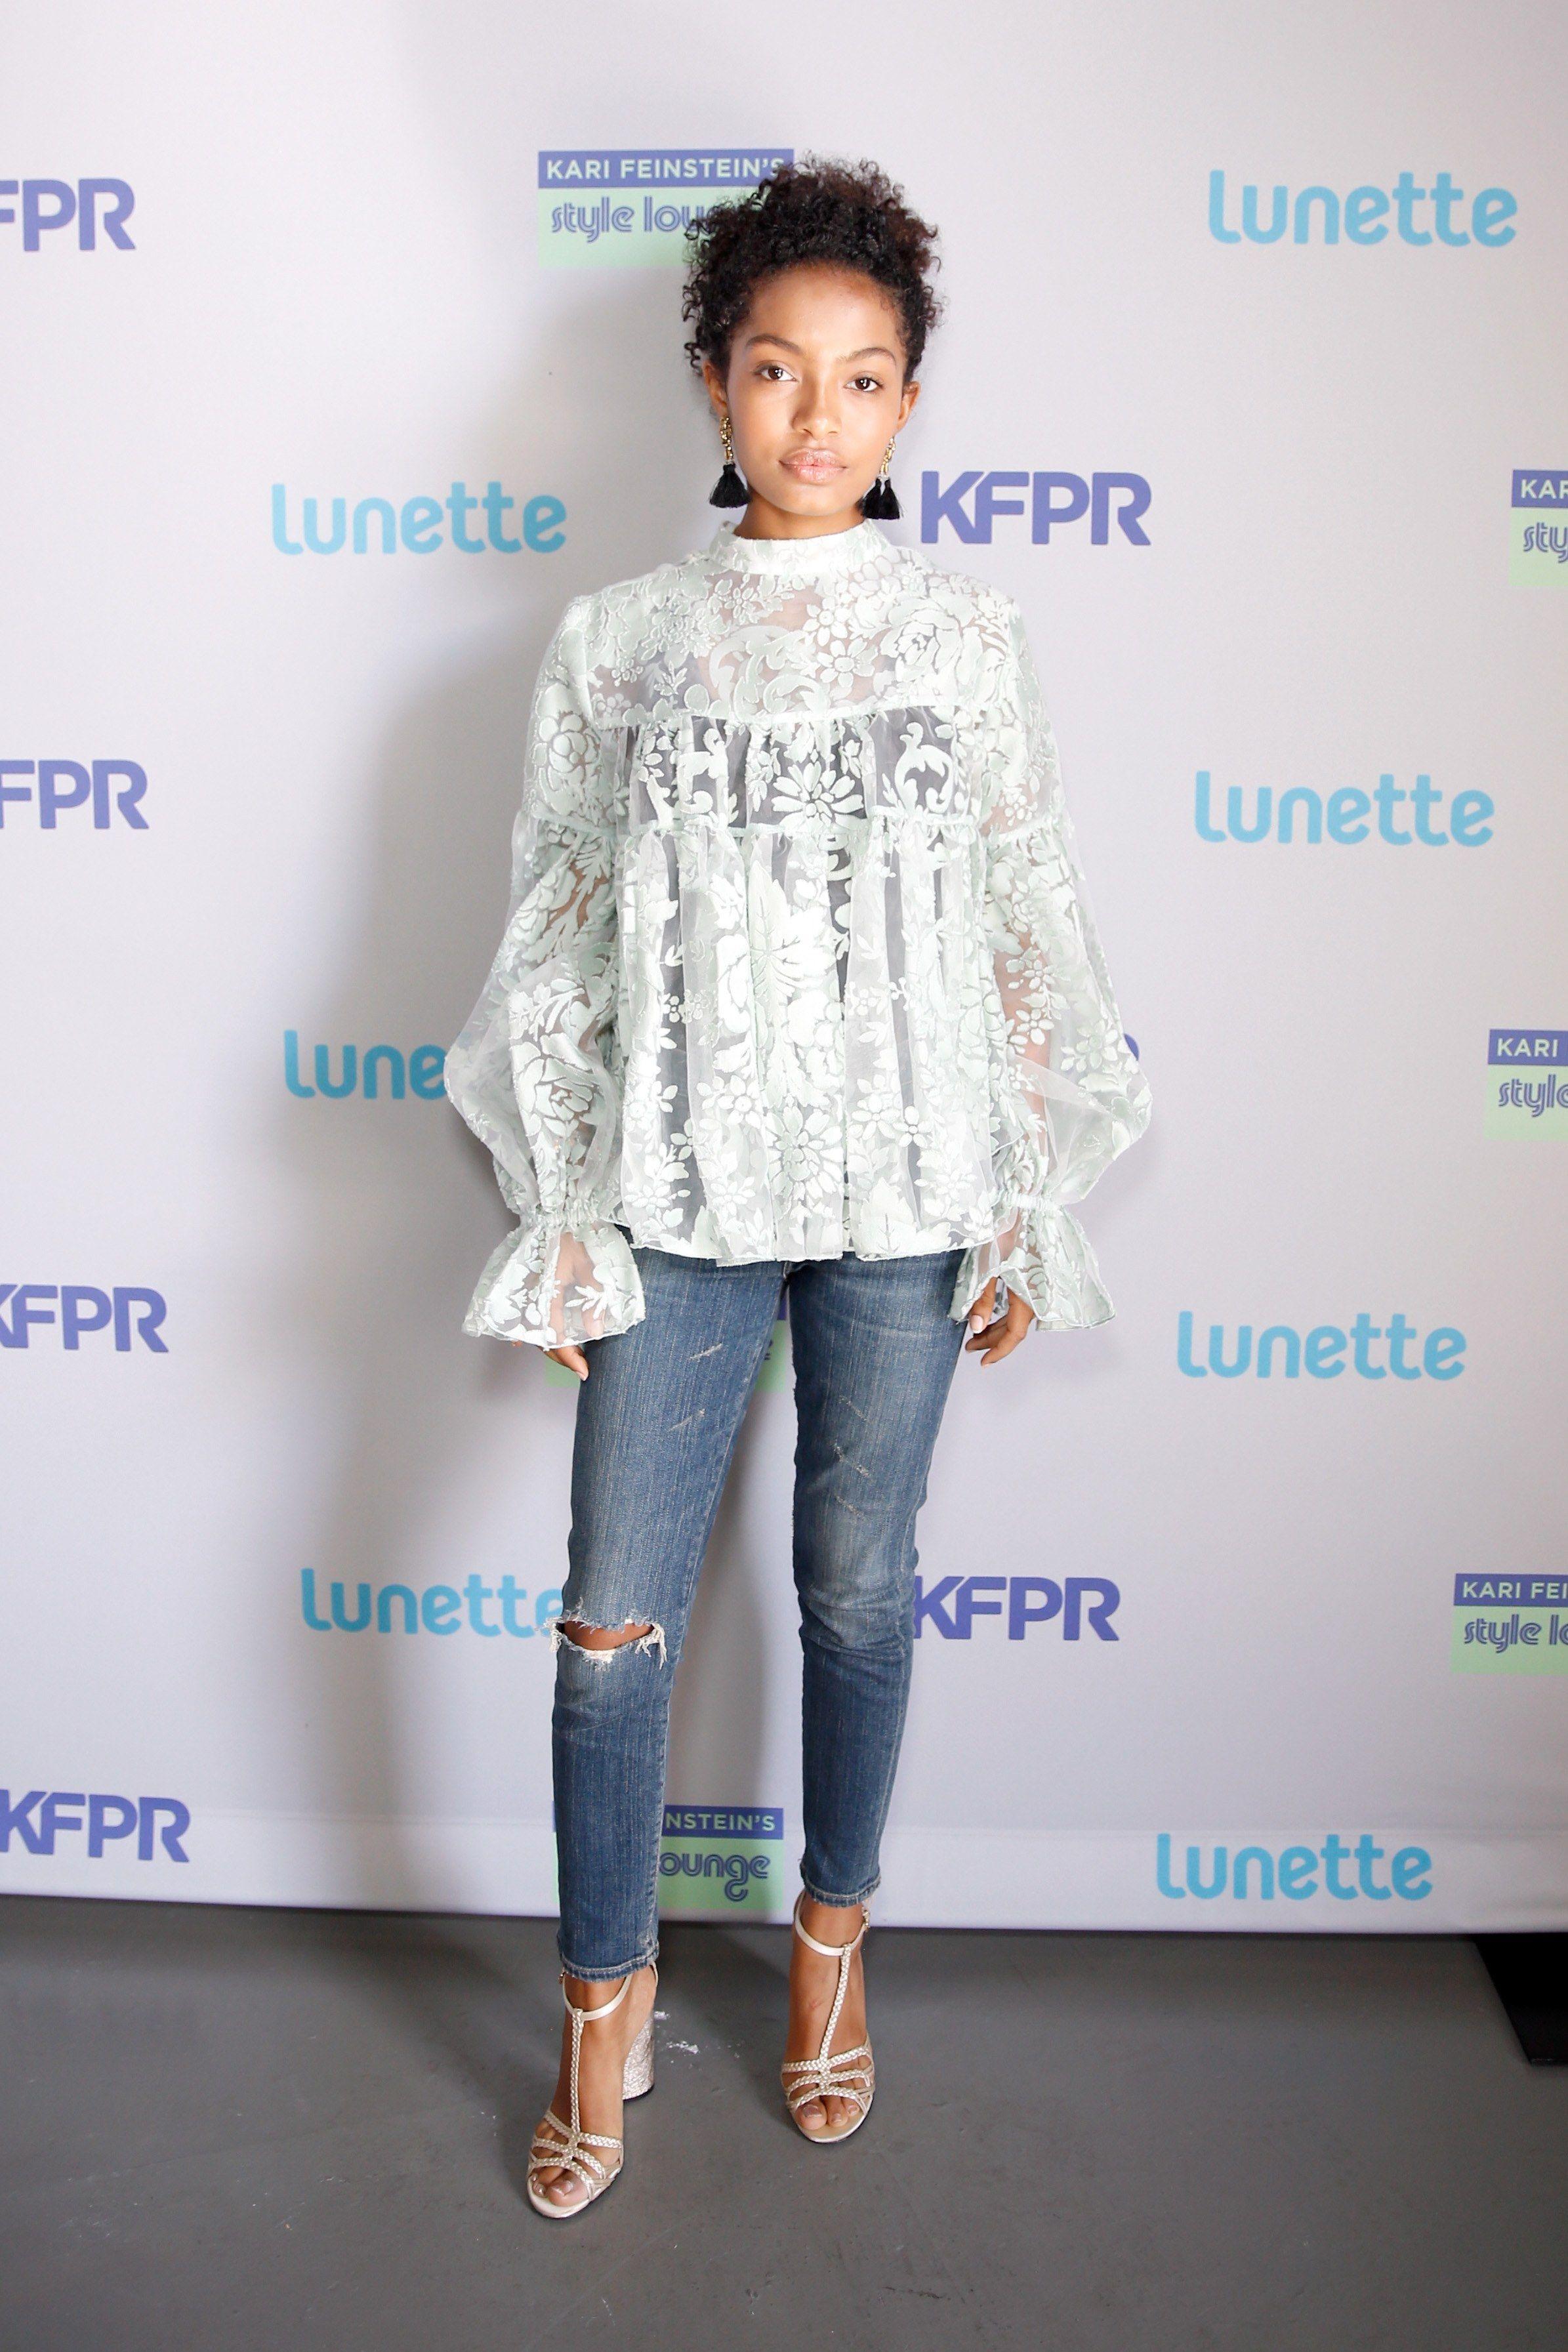 15 Yara Shahidi Outfits We Want to Borrow Forever | Teen, Clothes ...